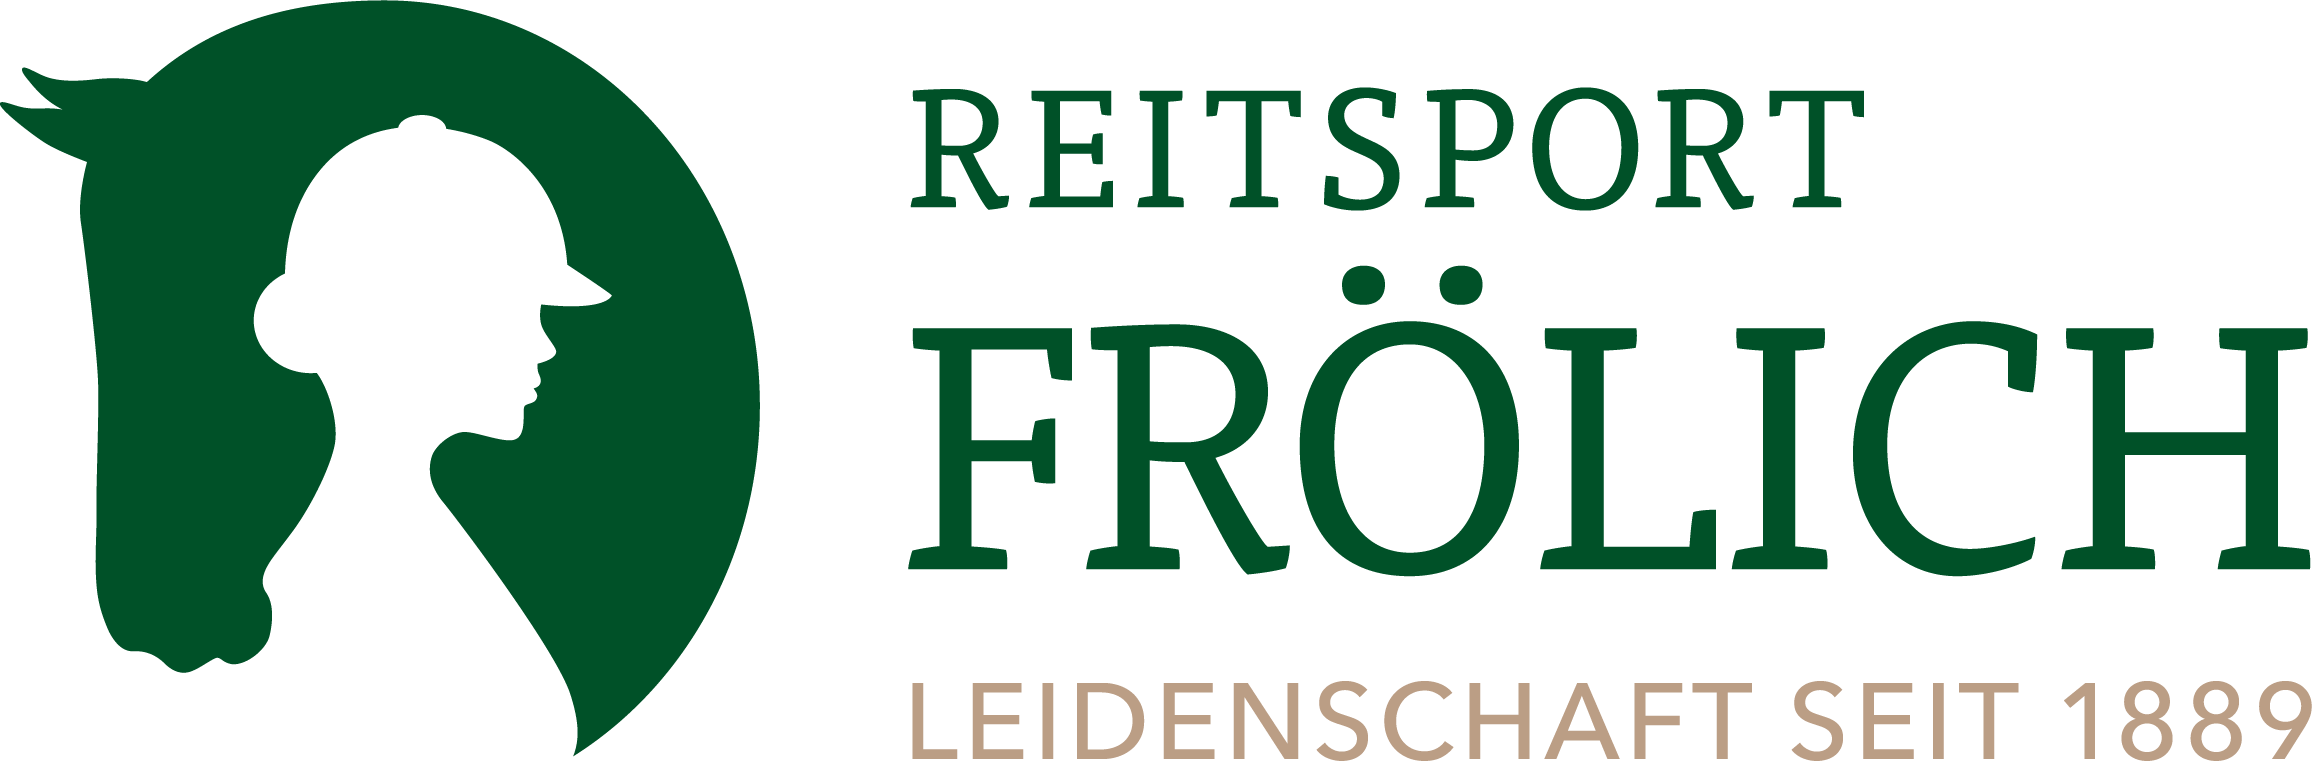 Reitsport_Froelich_Logo_RGB_300dpi (1).png